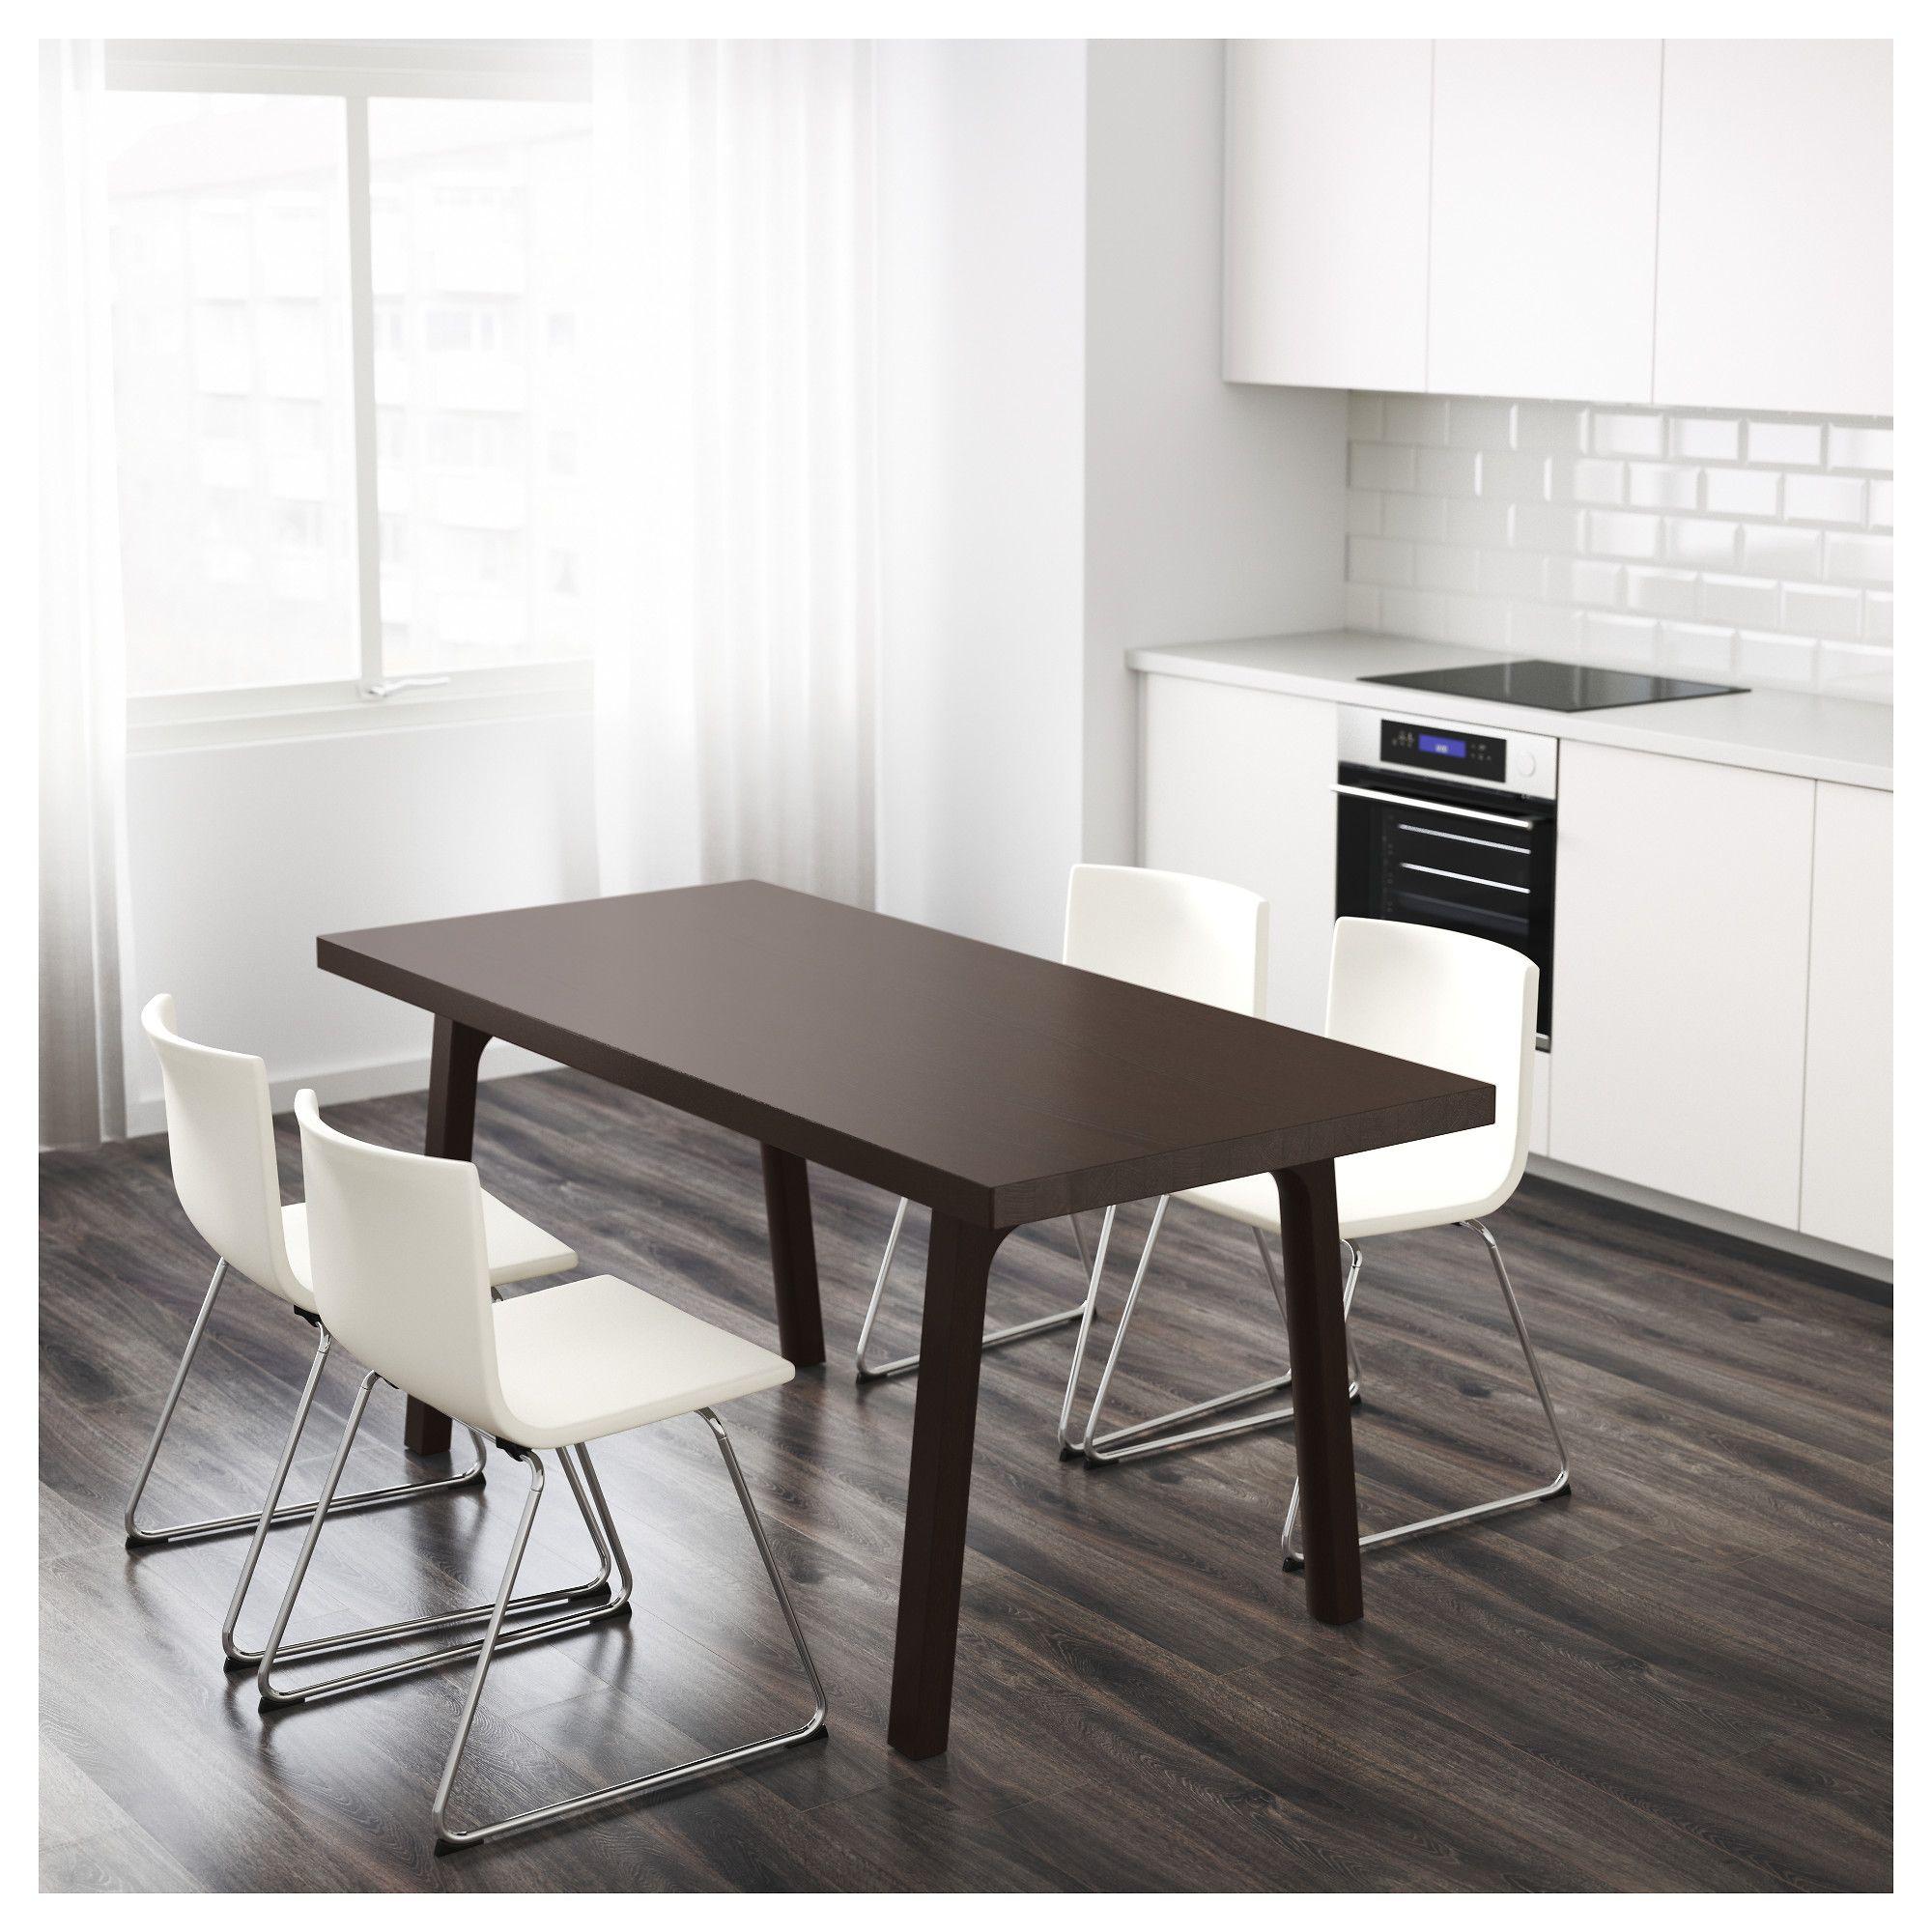 1a74cf7c694748cedd120440eee80779 Impressionnant De Ikea Table Exterieur Conception